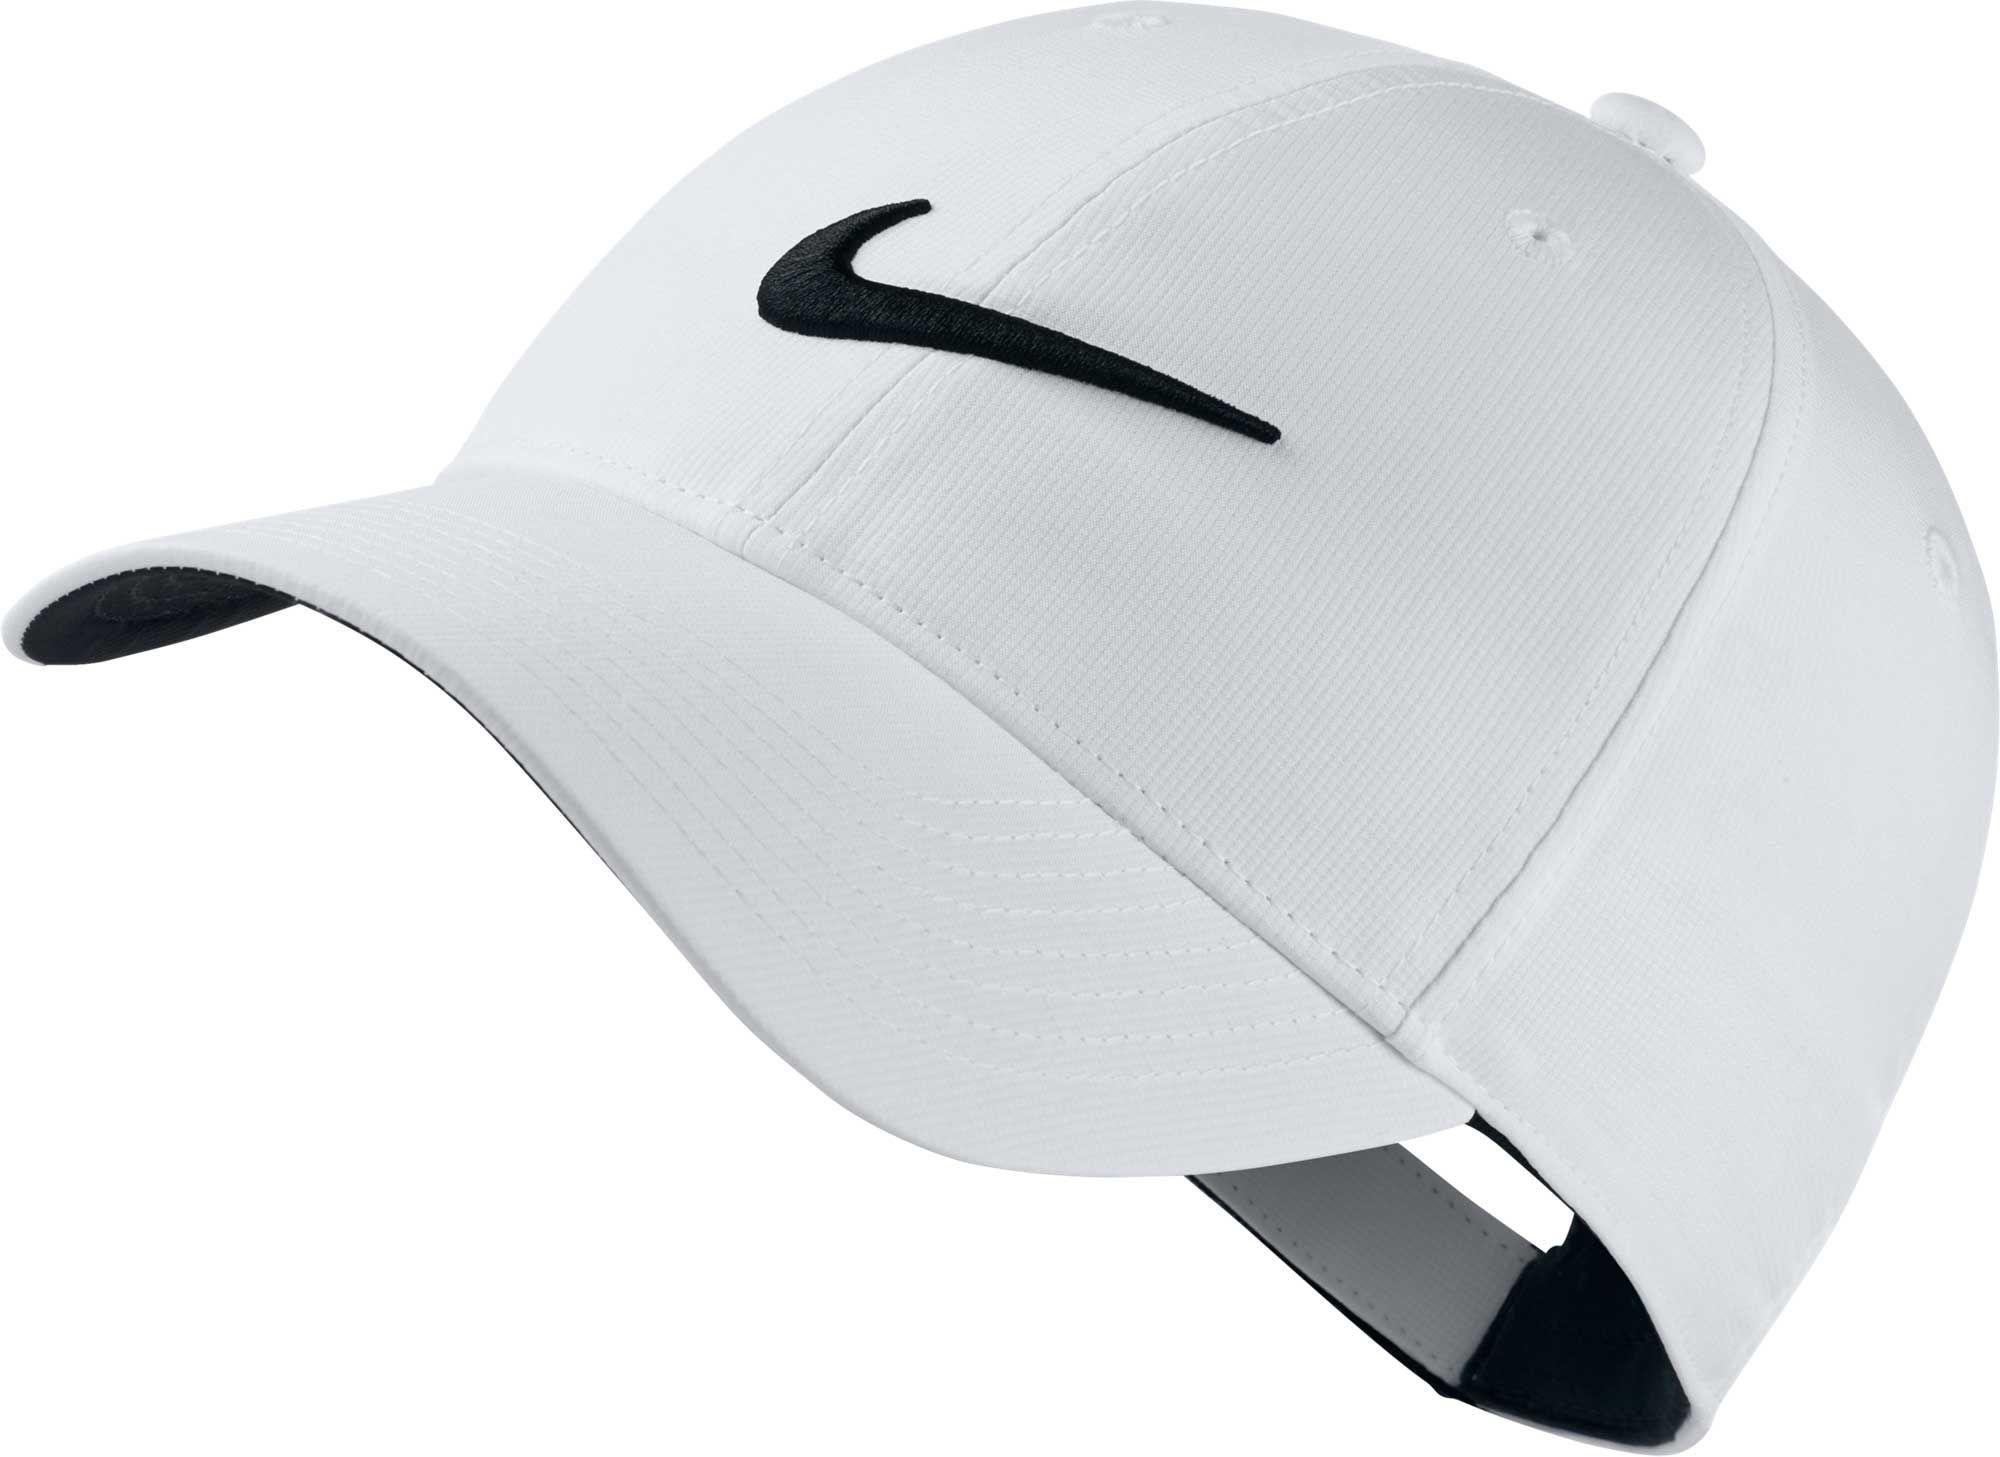 3743b3246a4d8 Nike Legacy91 Tech Golf Hat in White for Men - Lyst